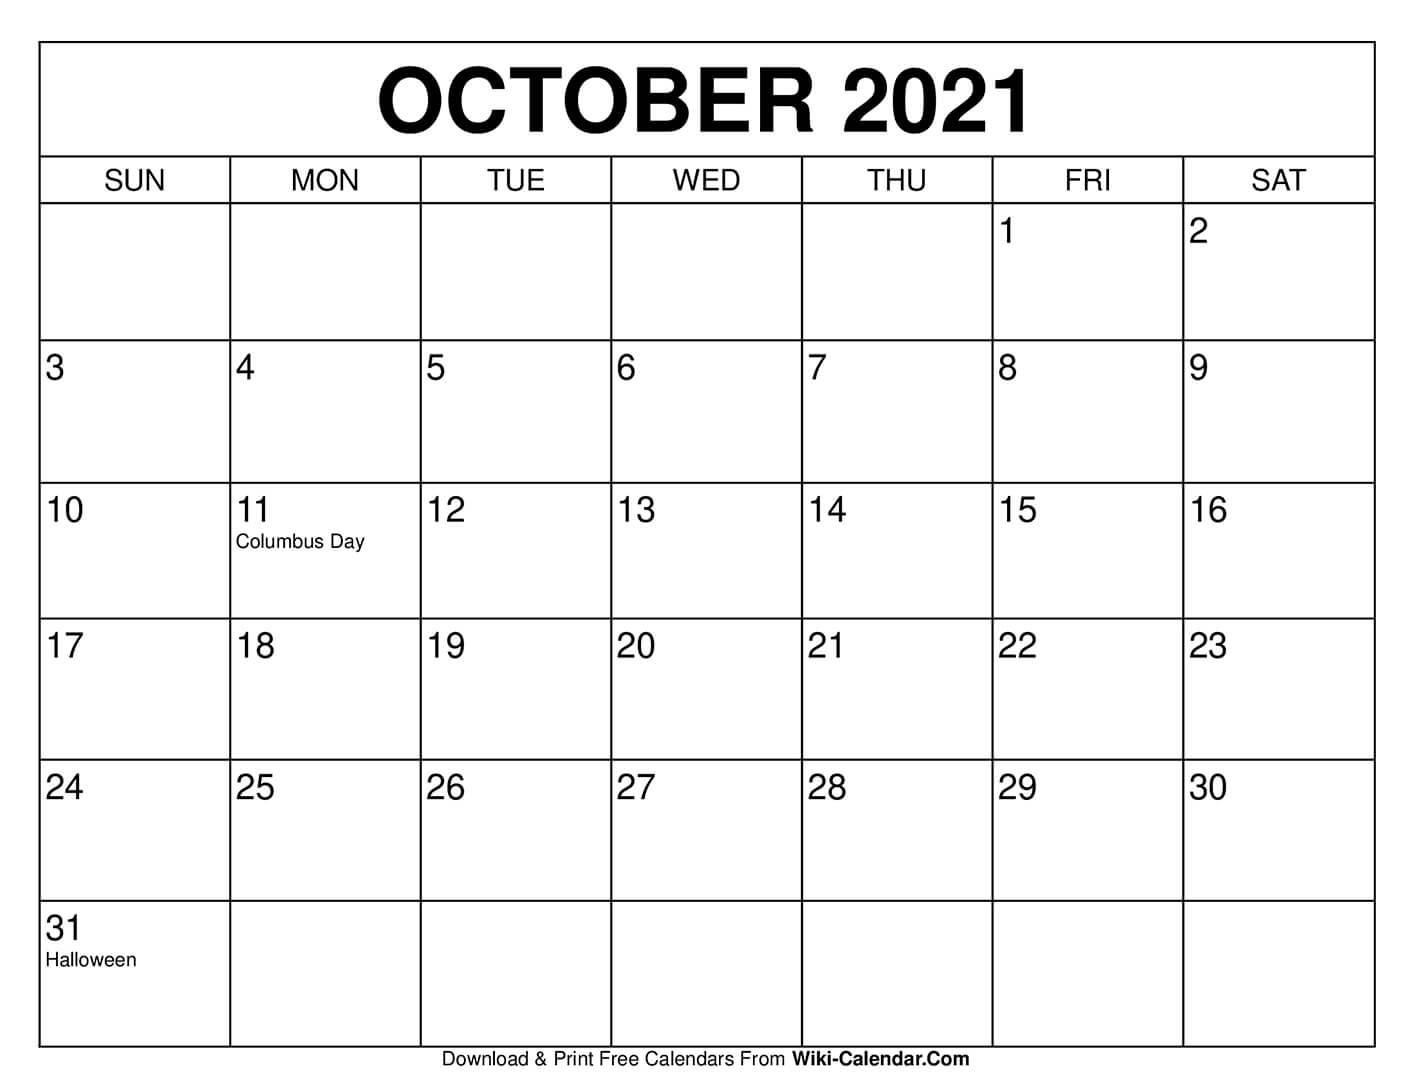 October 2021 Calendar Free Printable | 2021 Printable